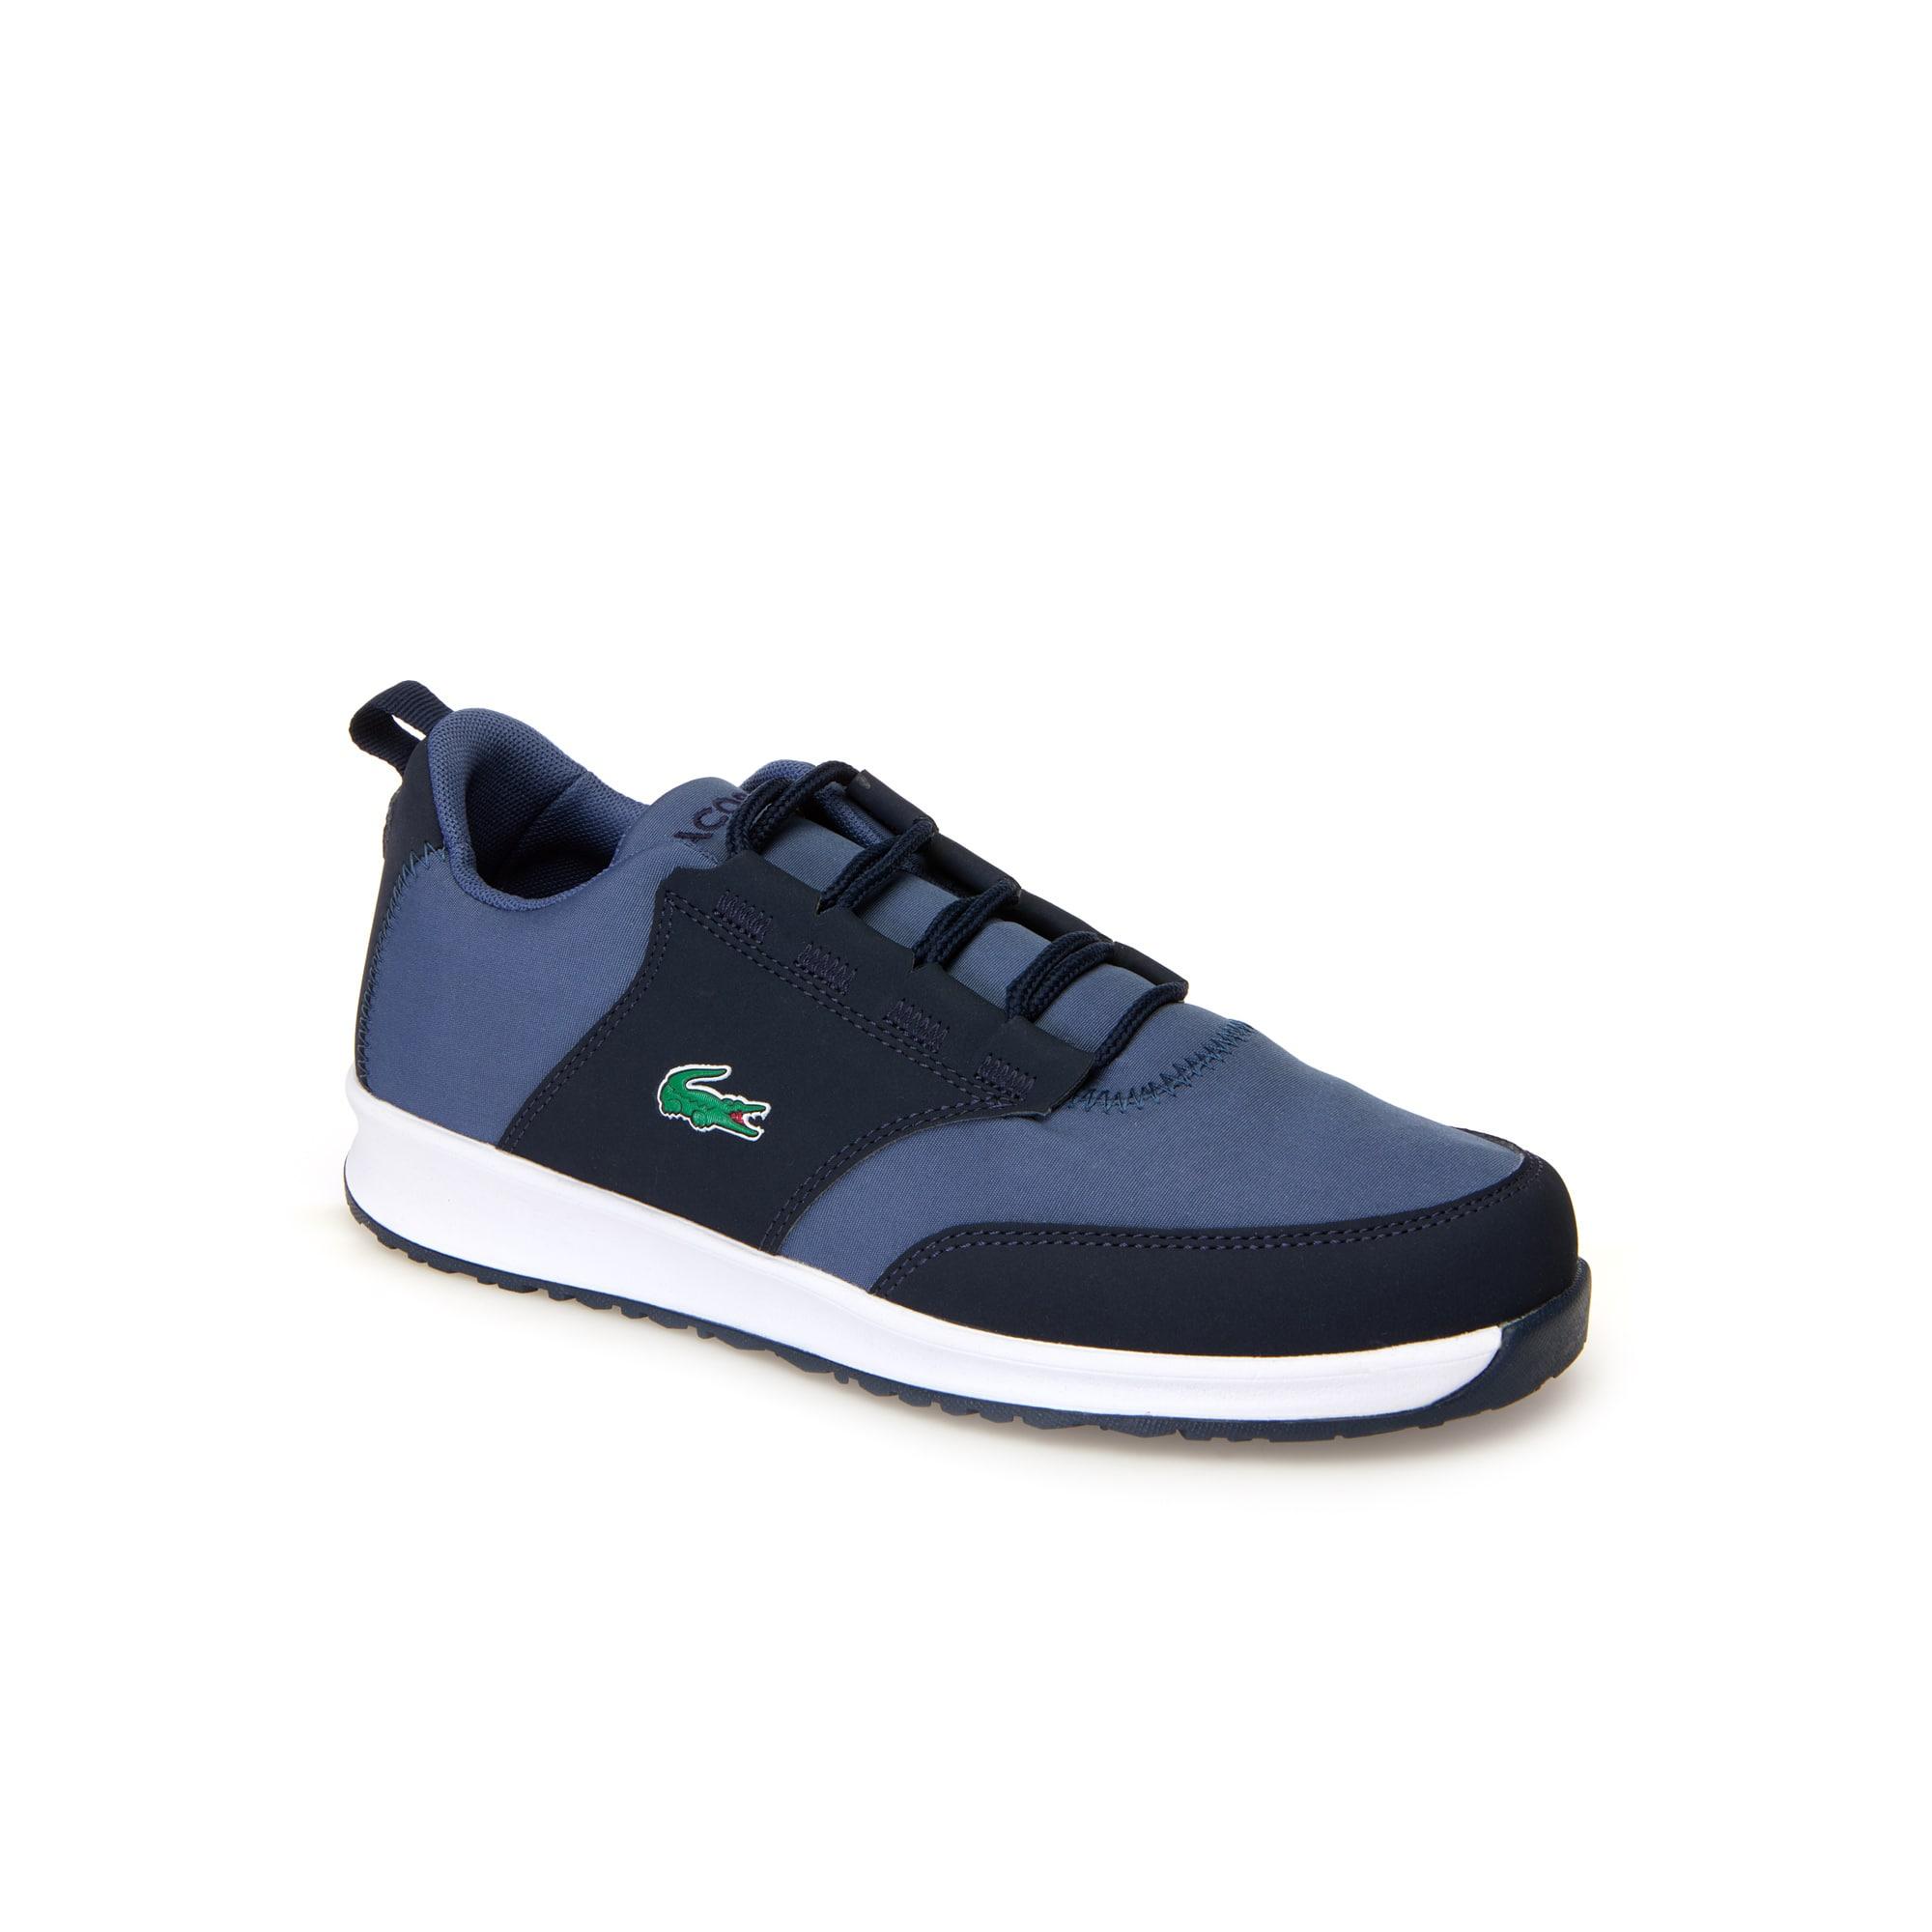 Teen-Sneakers L.IGHT aus Textil und Synthetik